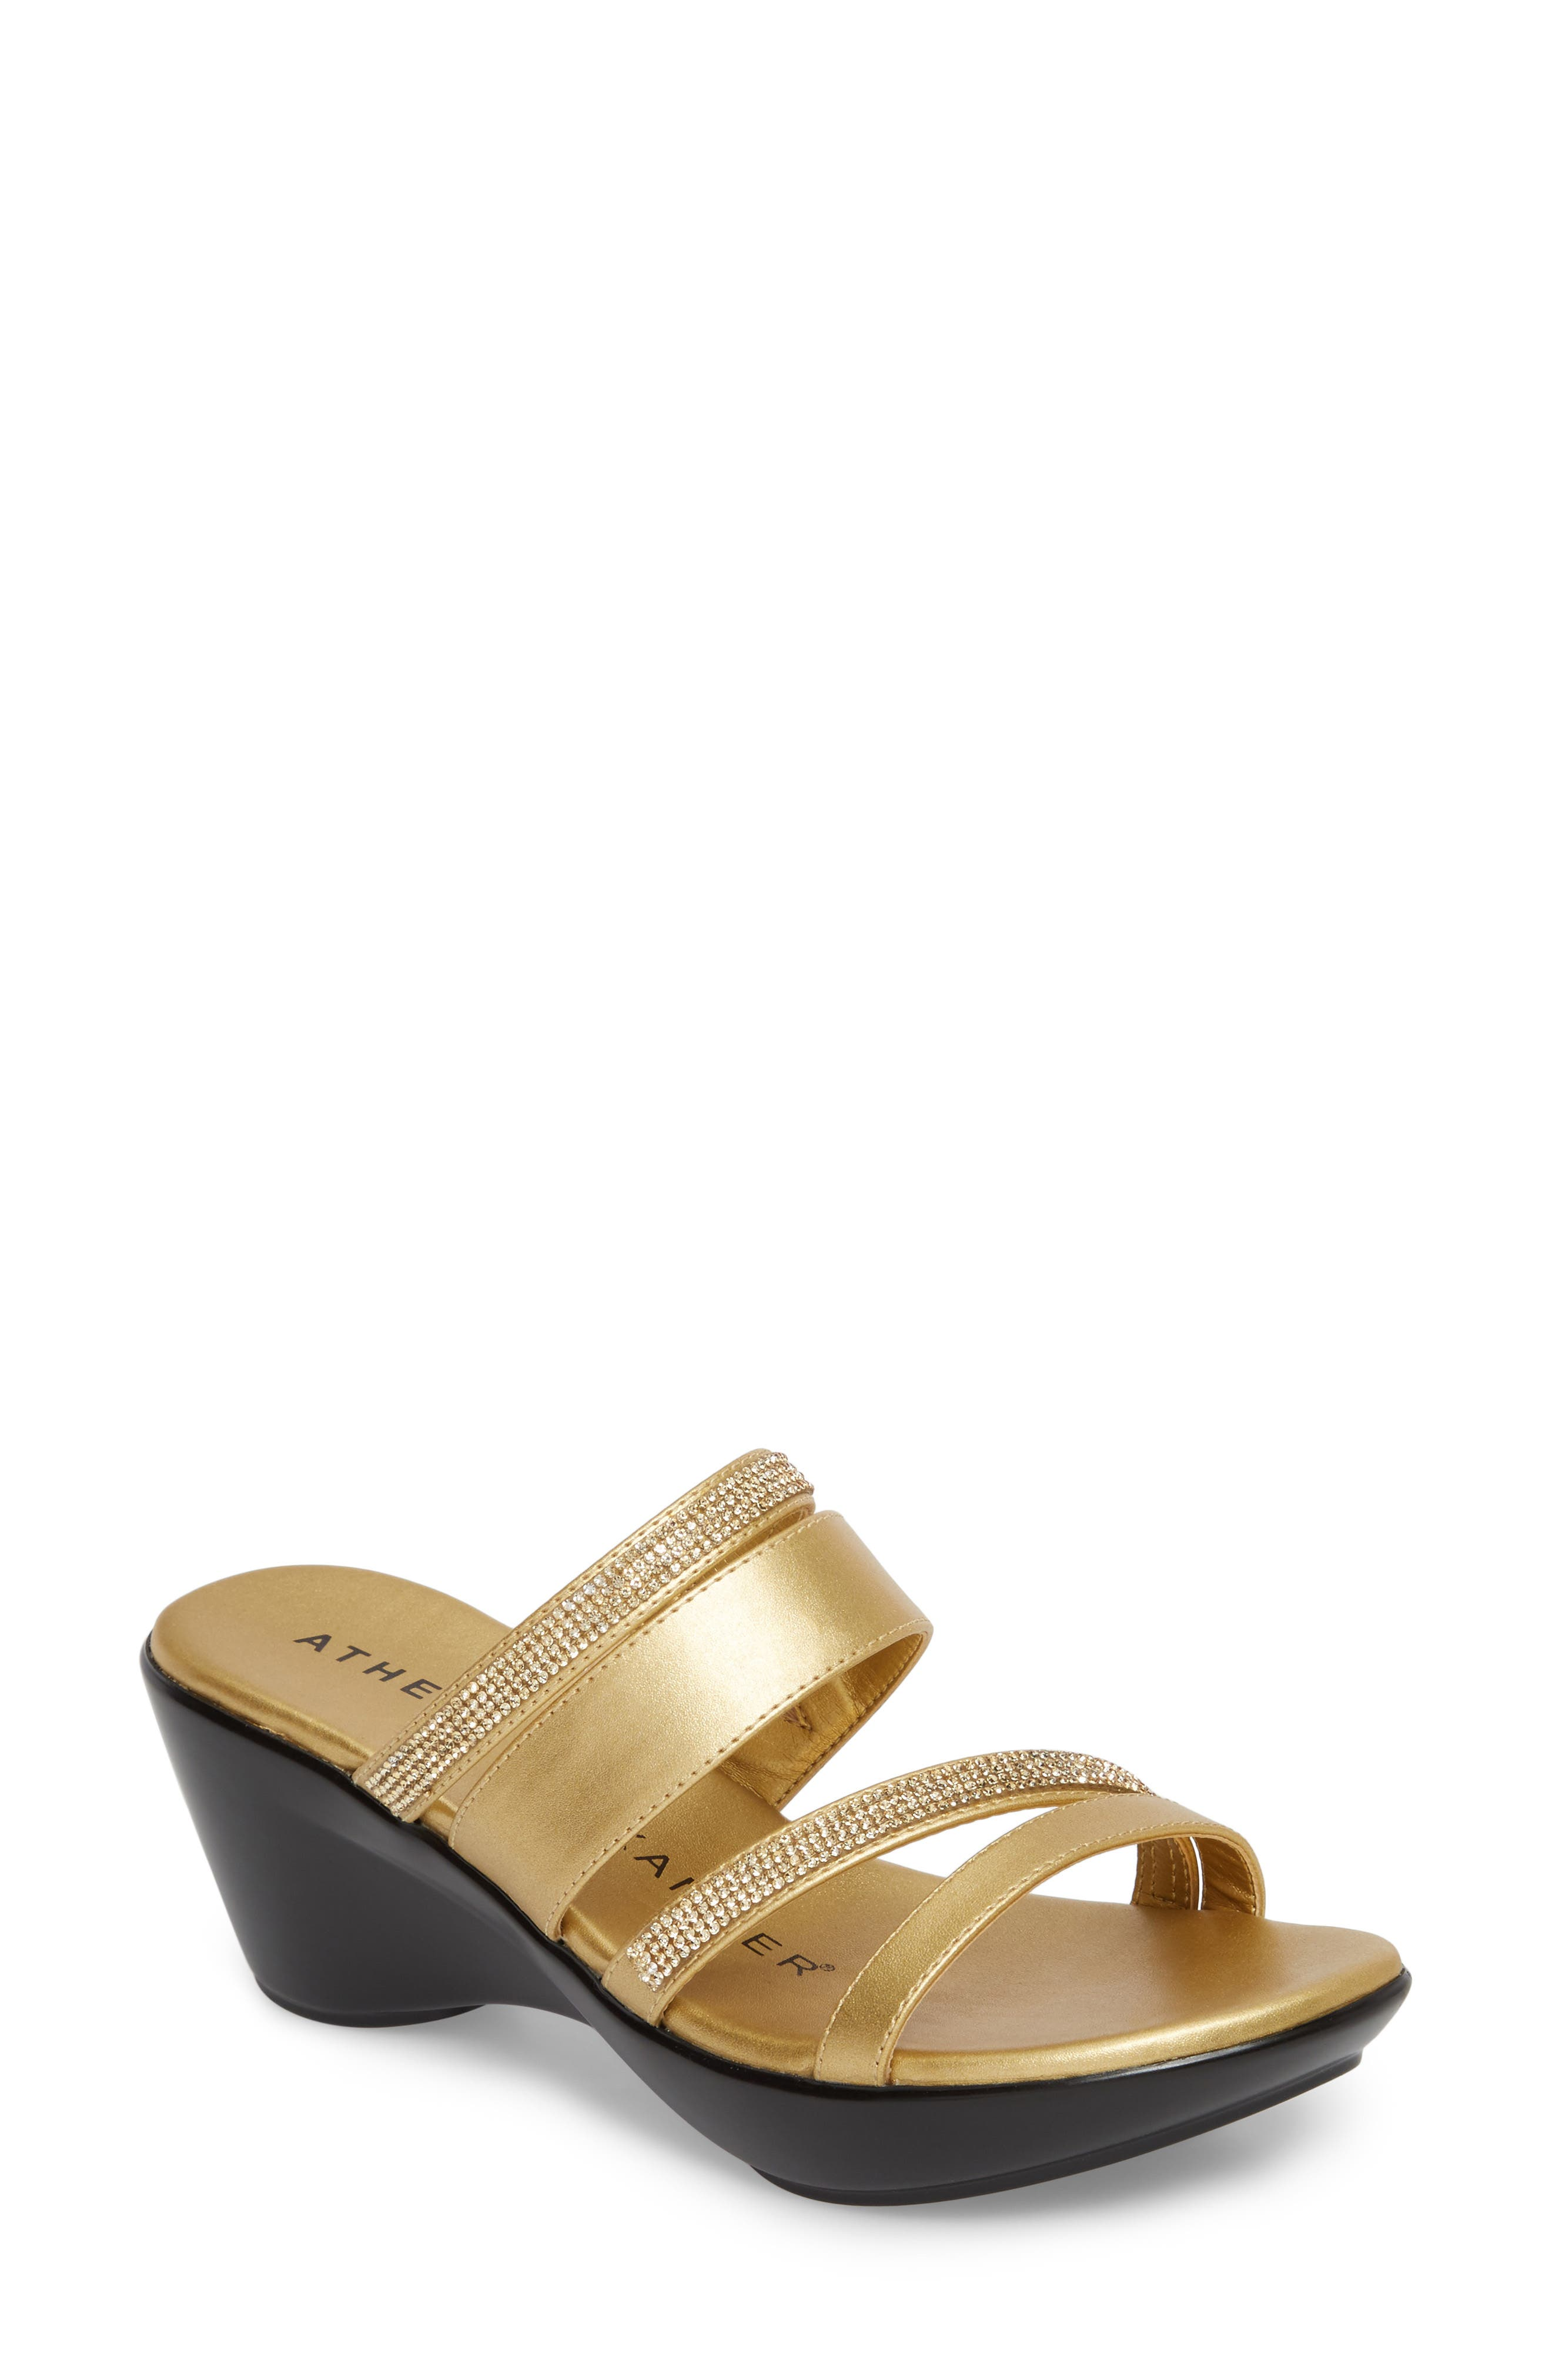 Athena Alexander Kozima Embellished Sandal- Metallic